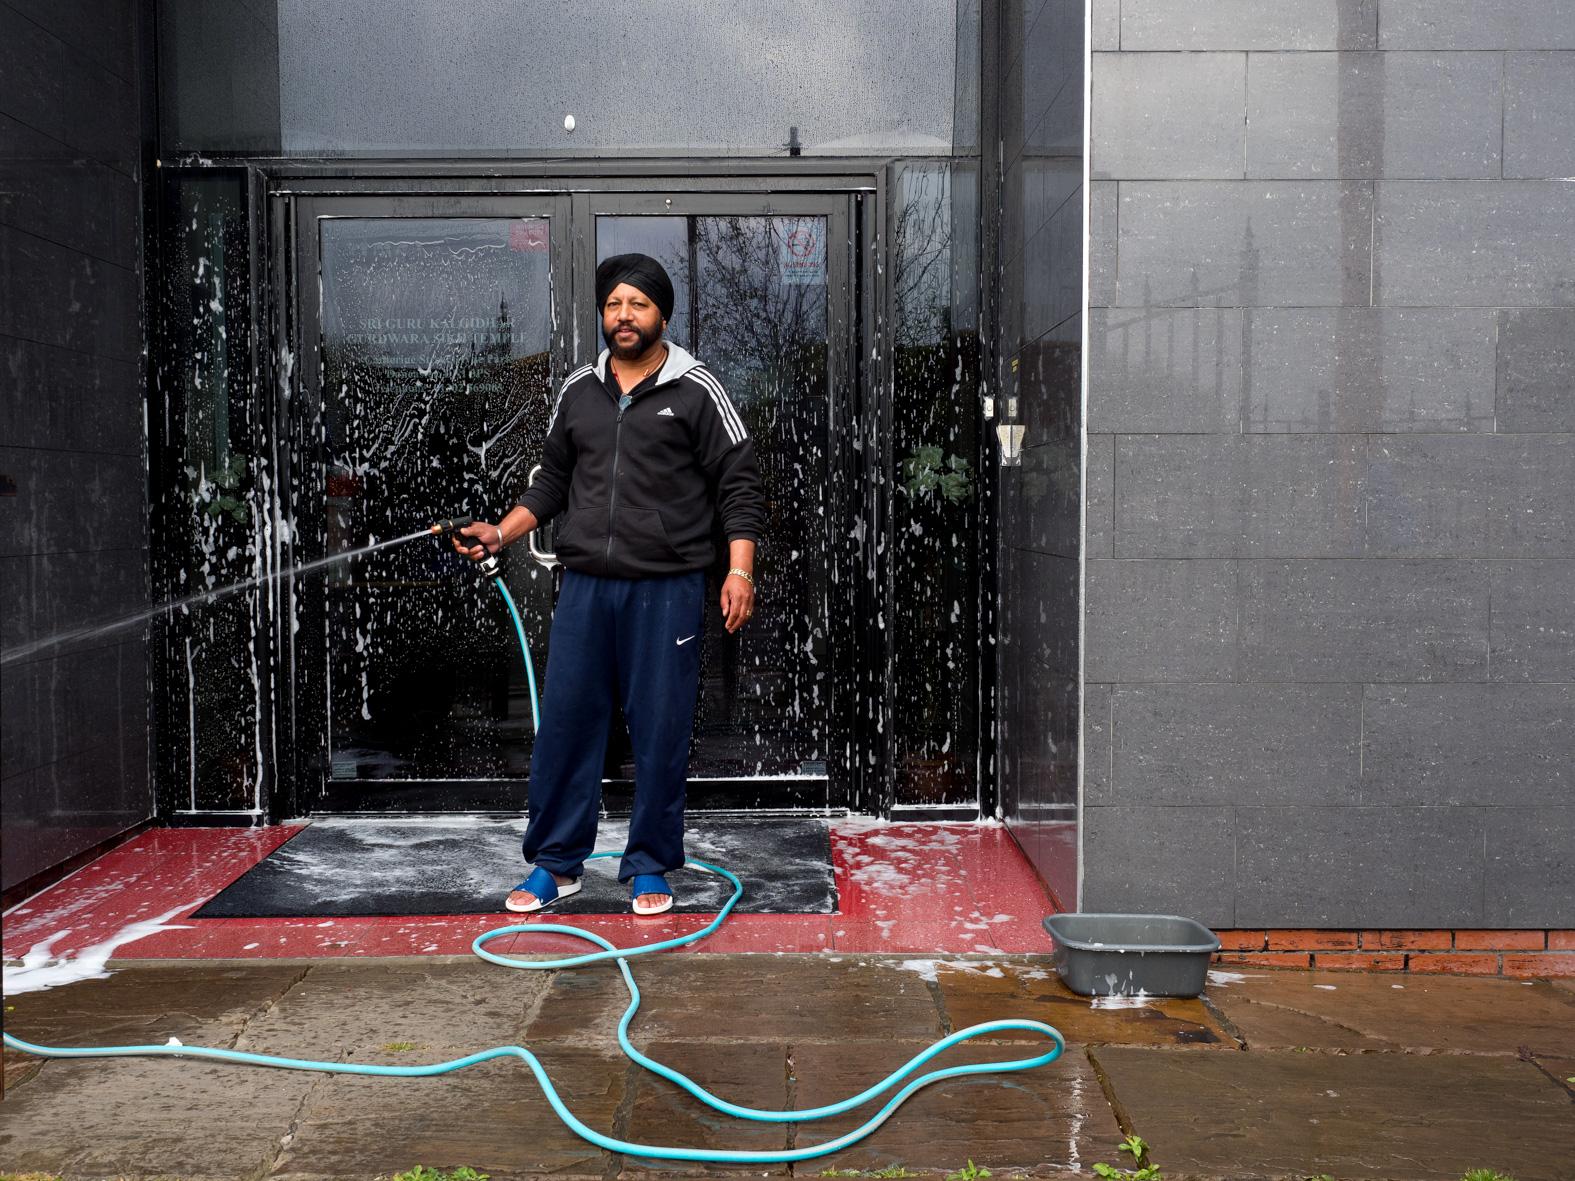 56 year old Sikh, Vaz, hoses down the entrance of Sri Guru Kalgidhar Gurdwara before worshippers arrive on a Sunday. Doncaster, South Yorkshire.